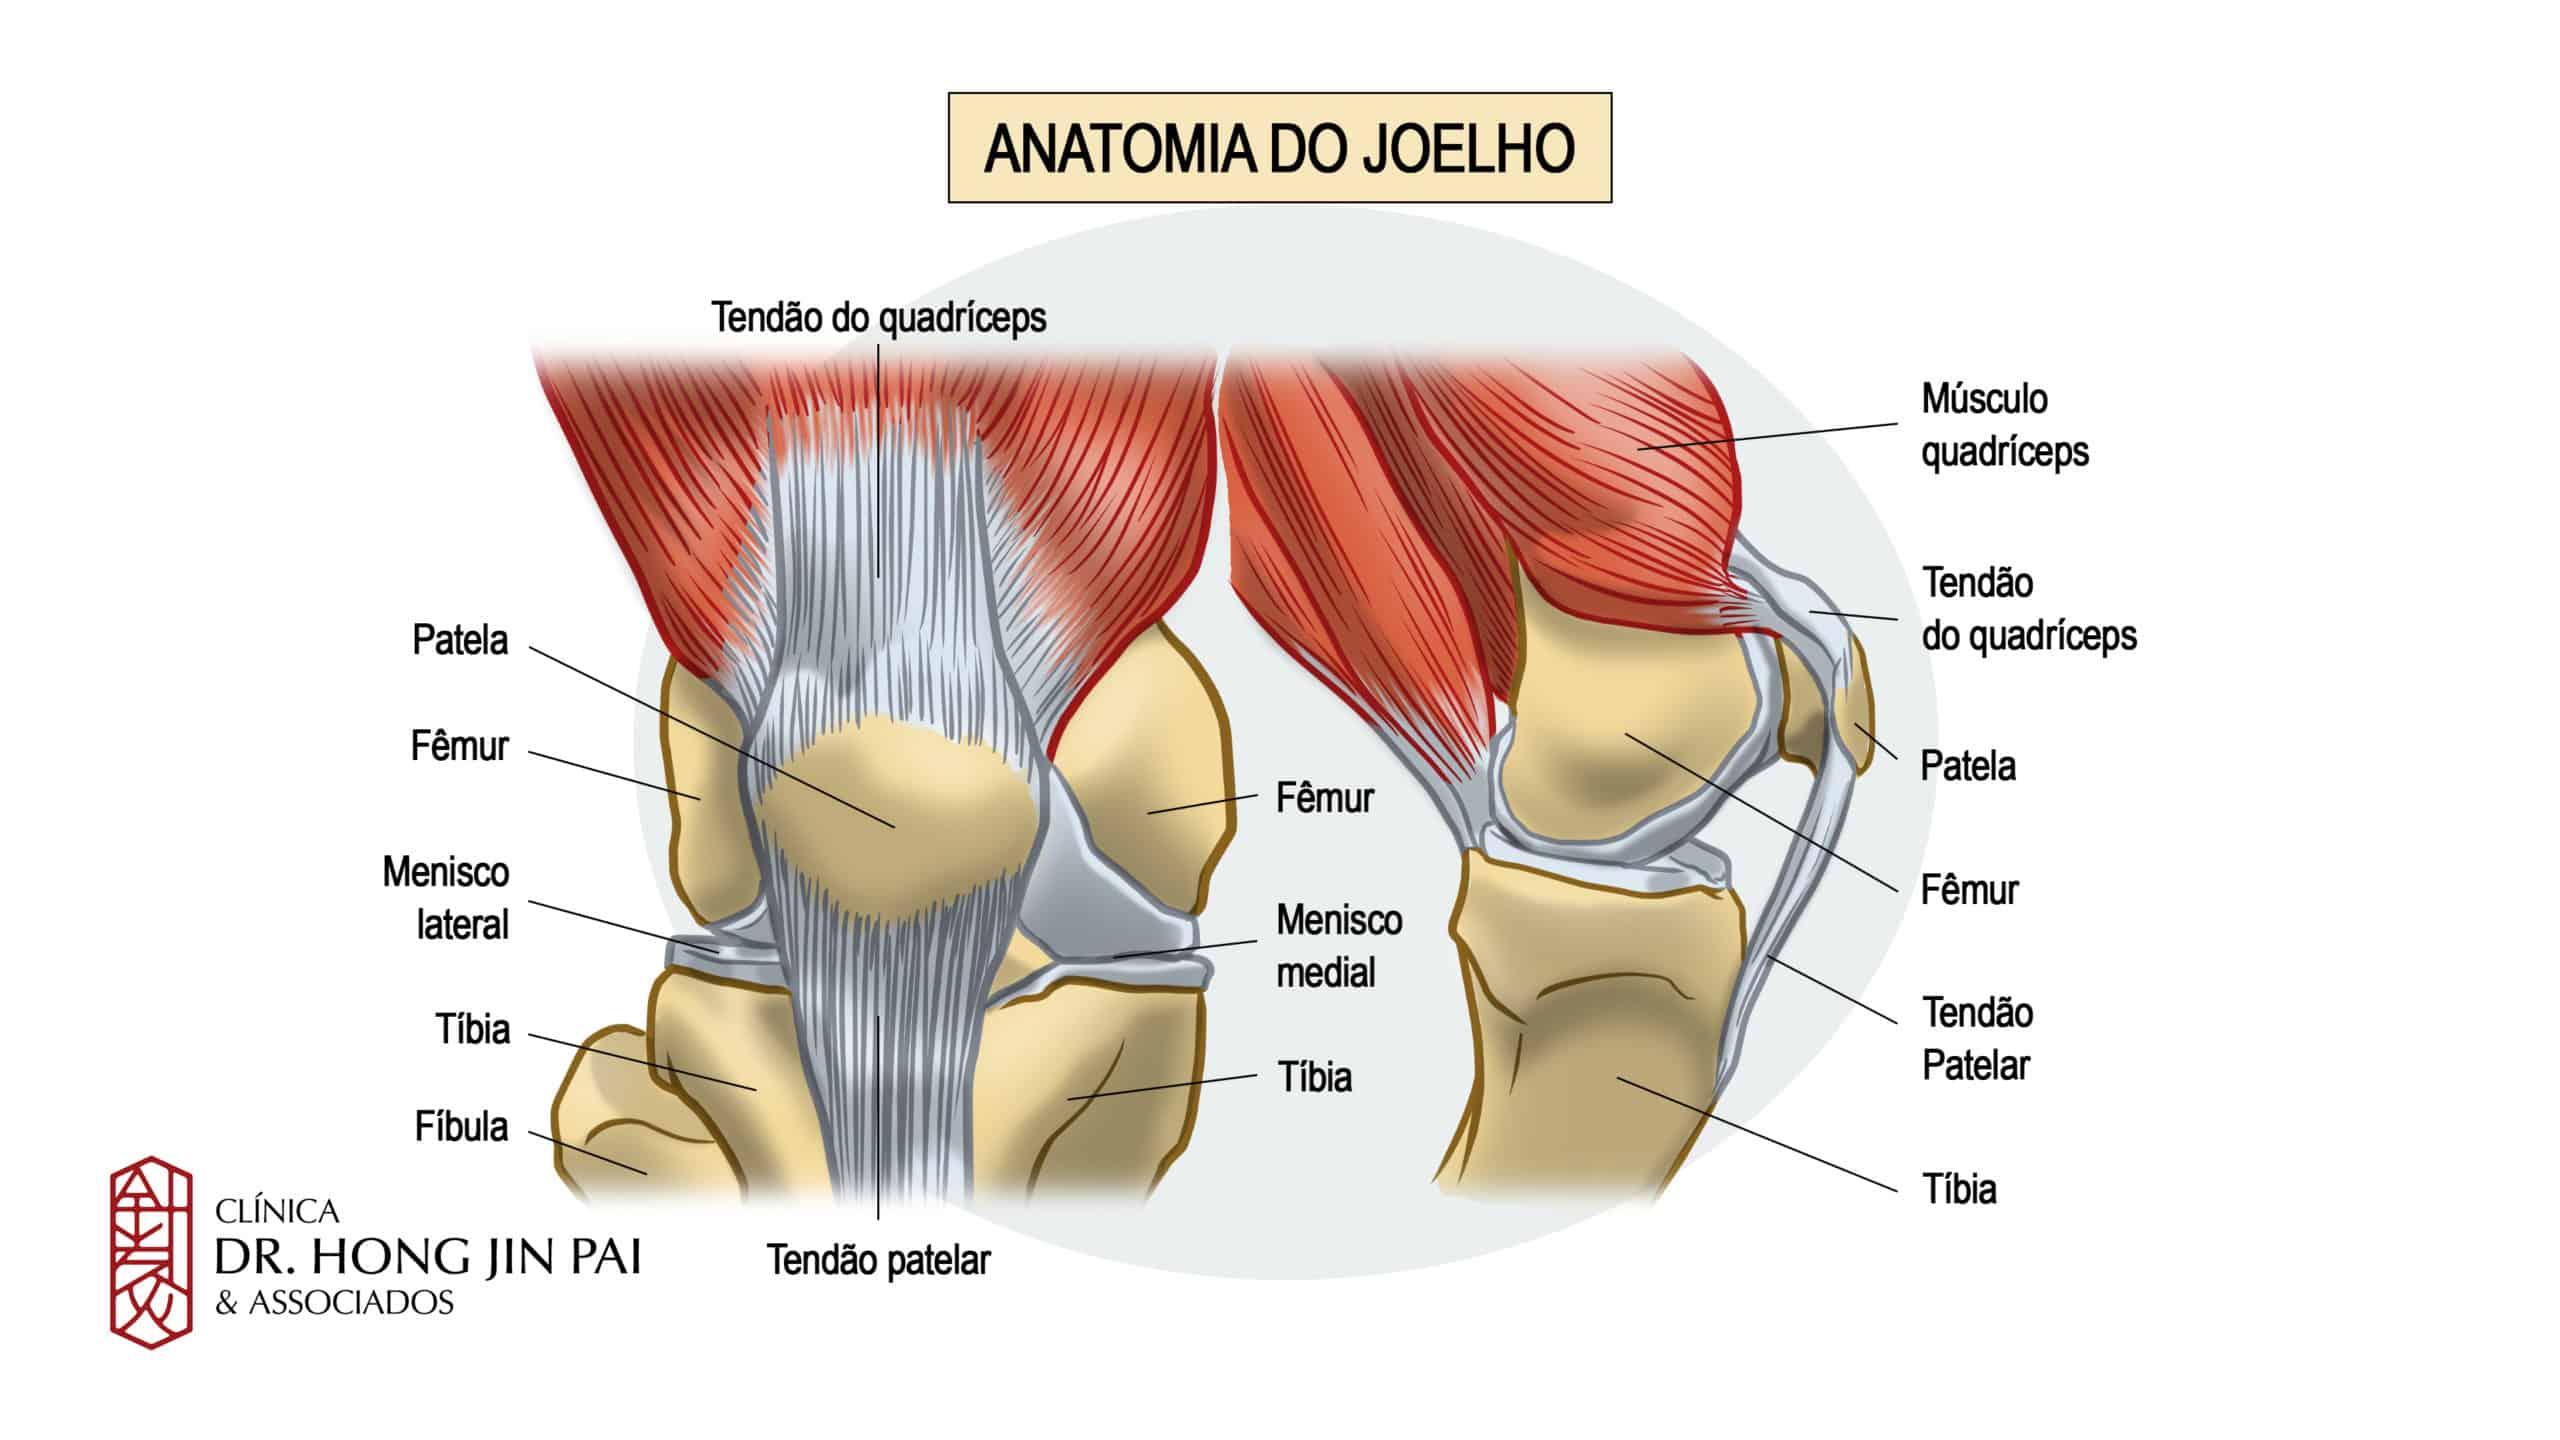 Anatomia Joelho